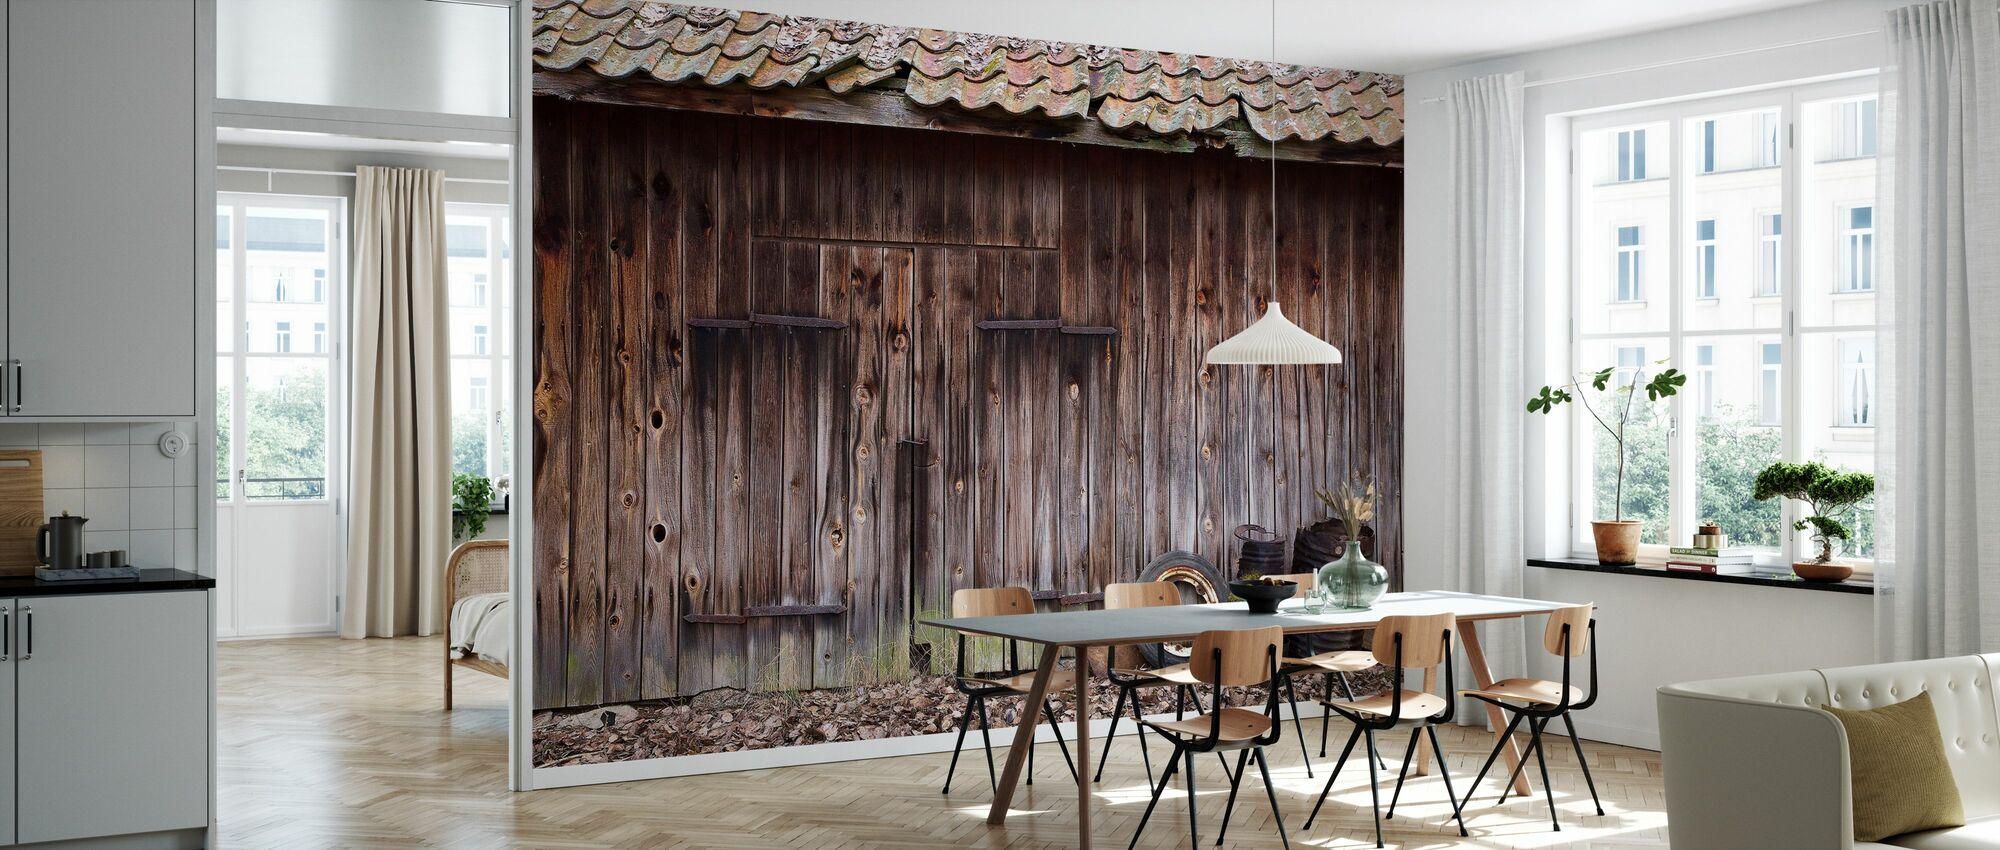 Old Barn - Wallpaper - Kitchen